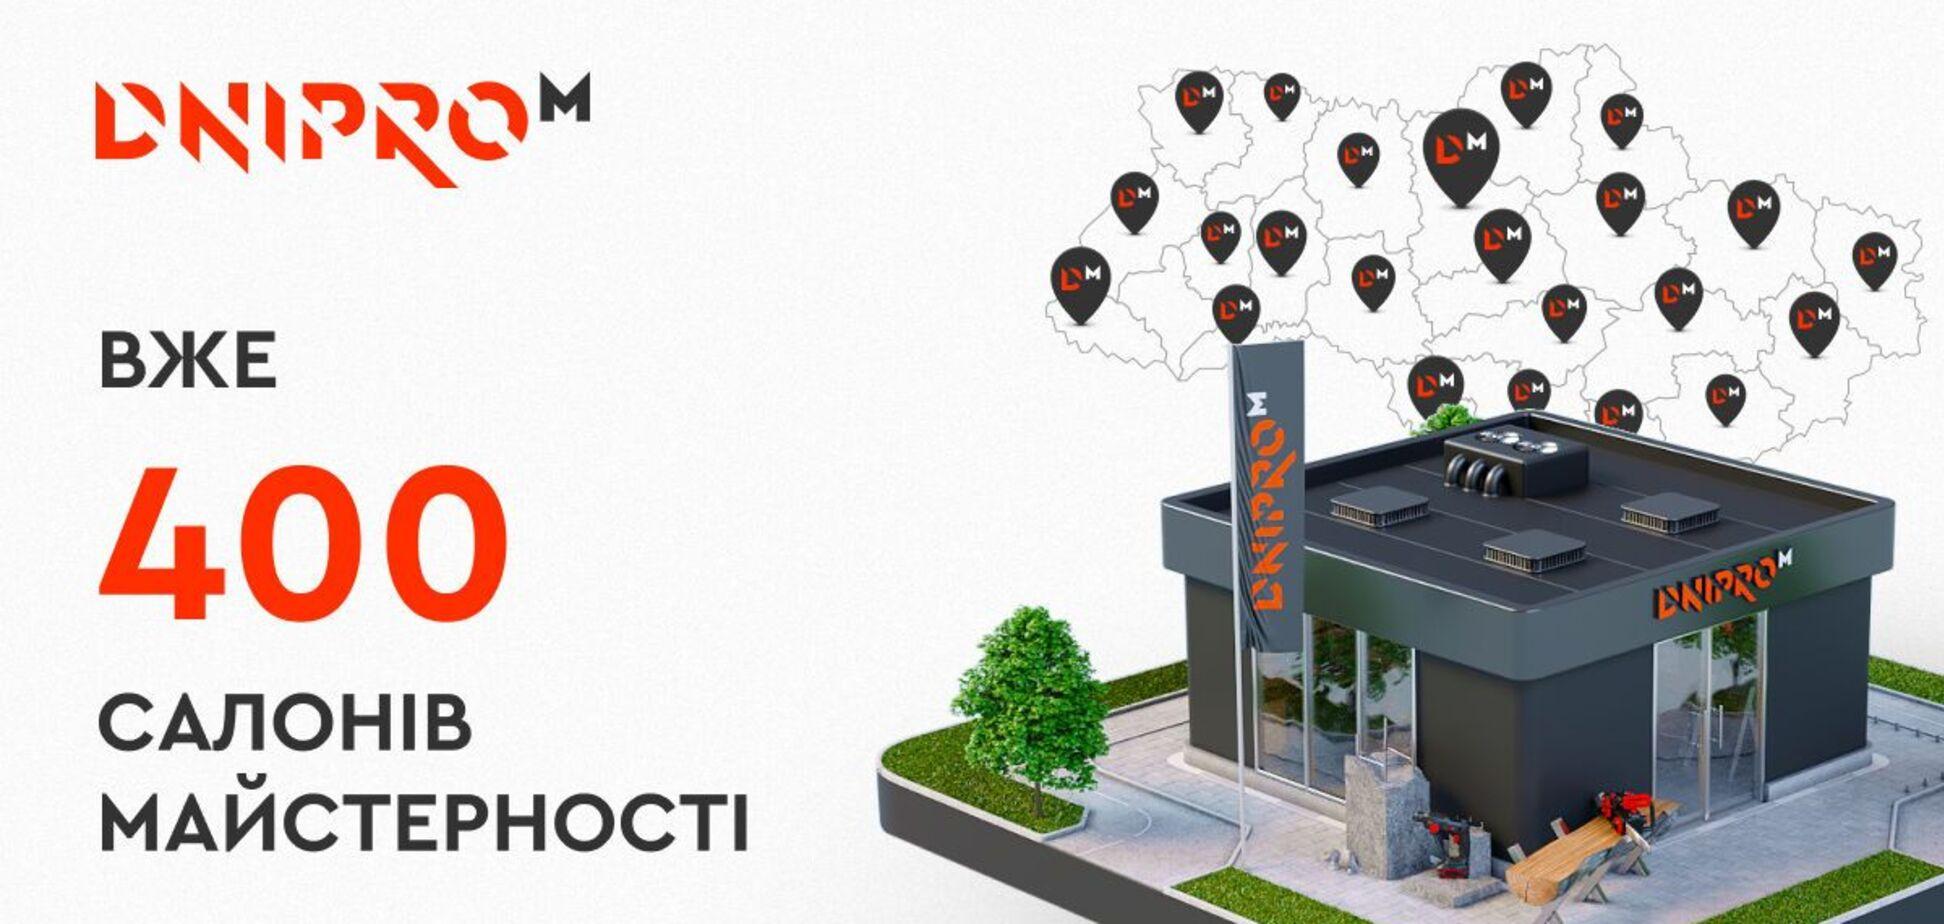 Бренд электроинструмента Dnipro-M открыл 400-й салон мастерства в Украине